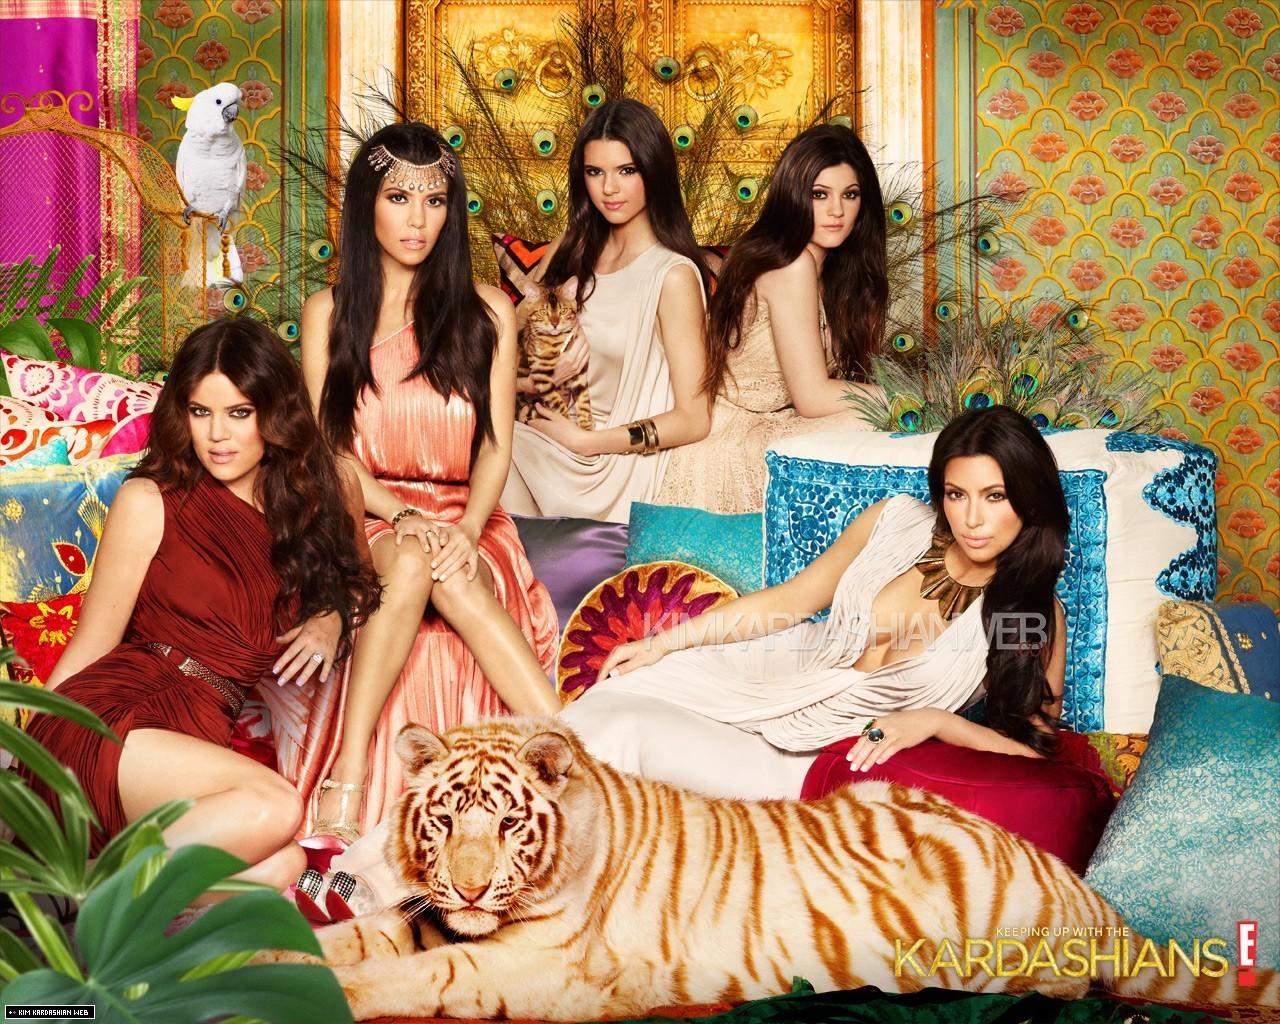 Keeping Up With The Kardashians: Season 5